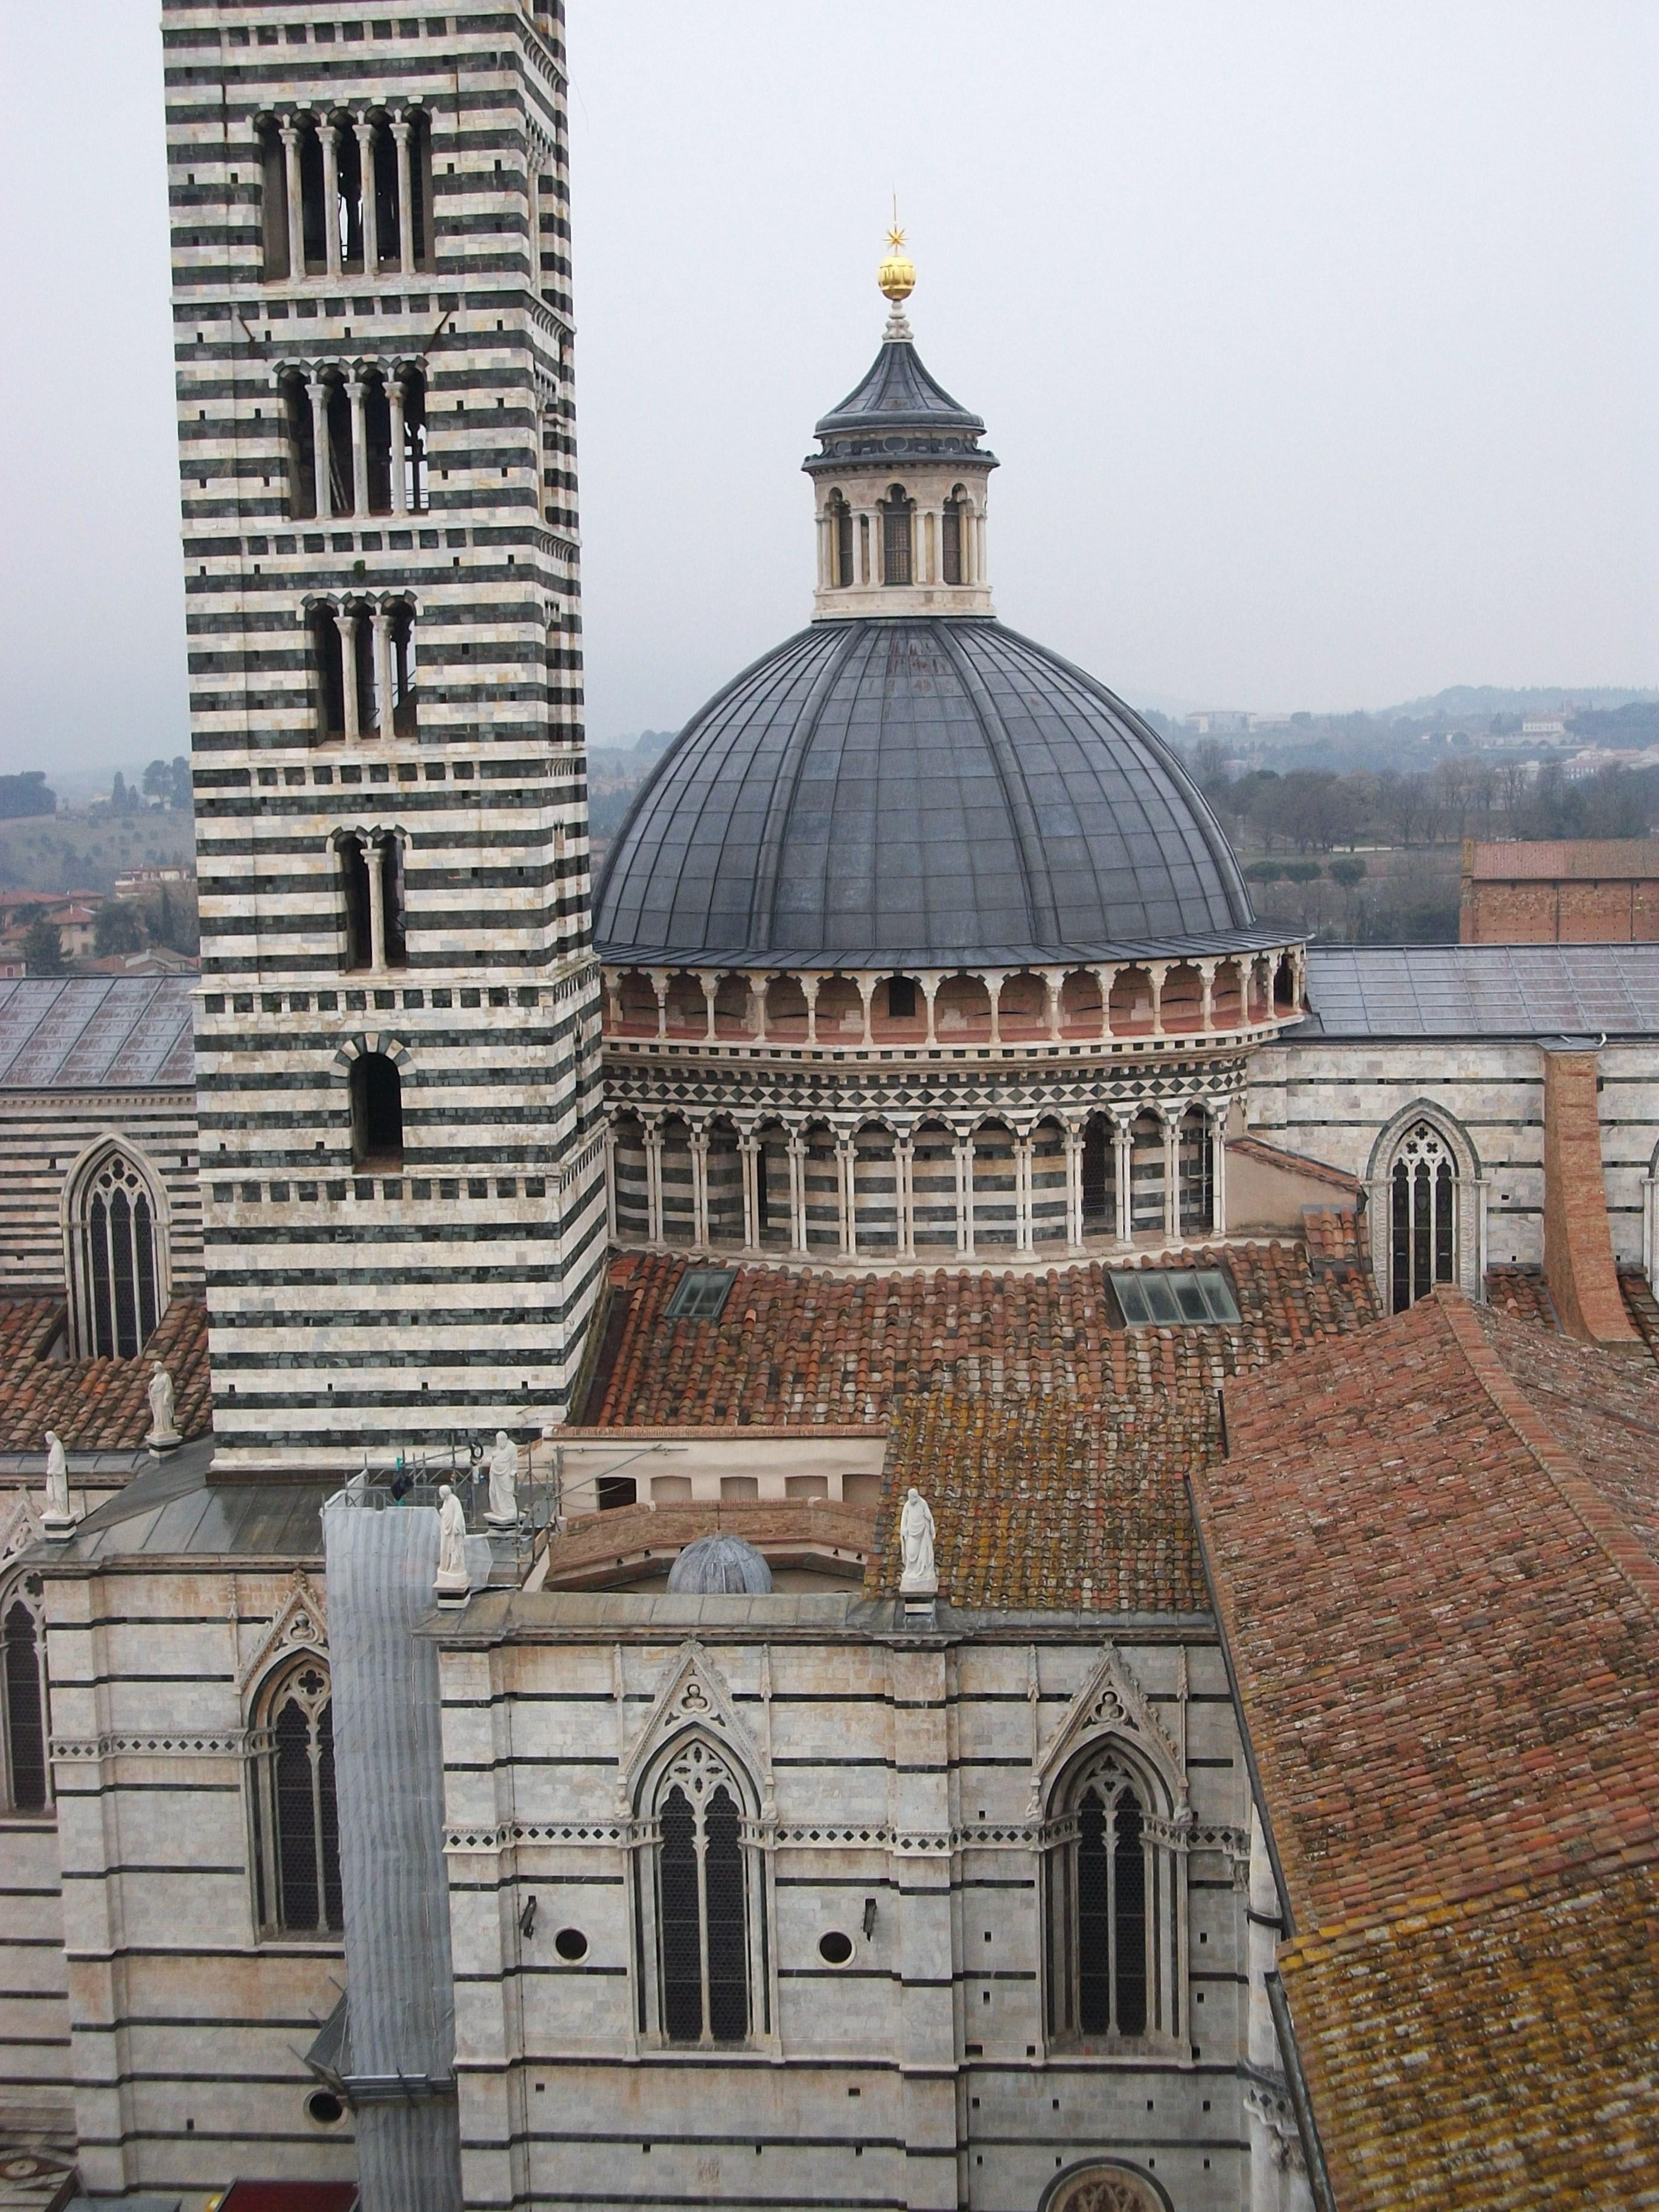 File:Cúpula (exterior) de la catedral de Siena.JPG ...